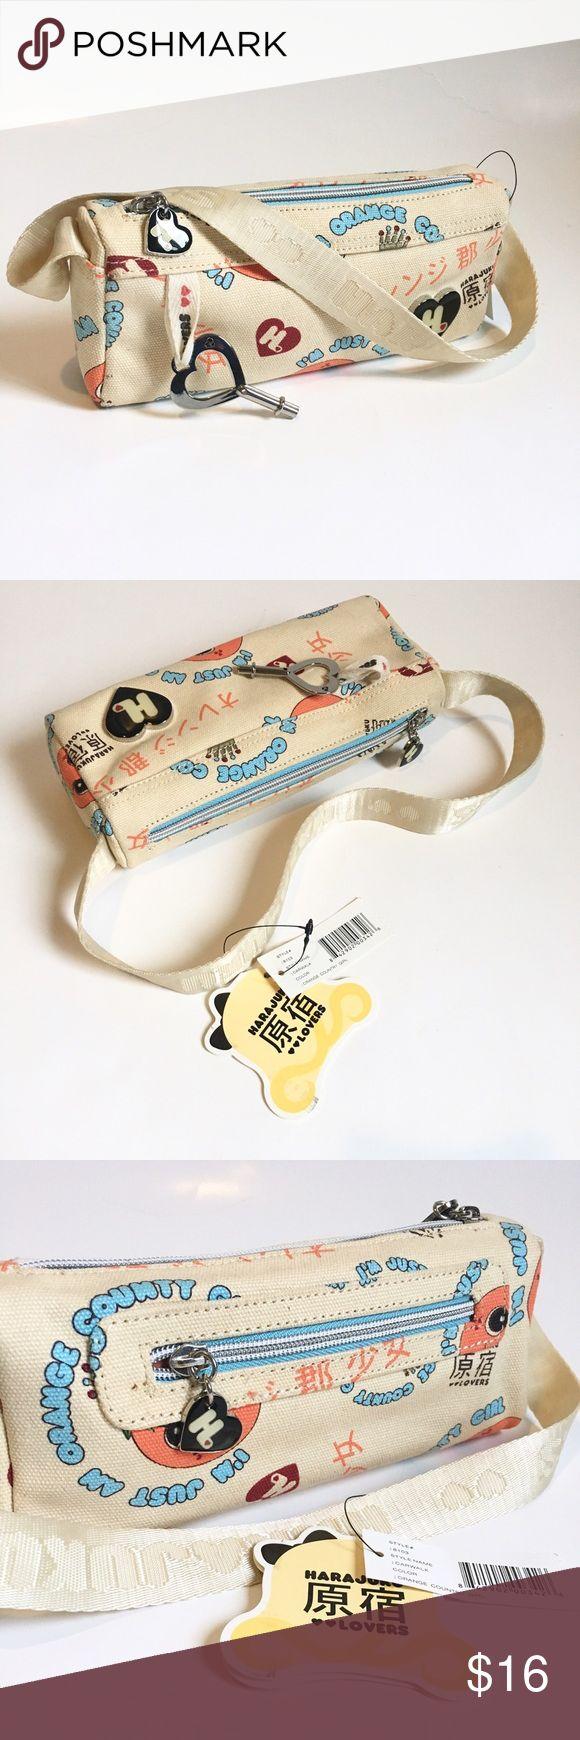 NWT Harajuku Lovers Bag Brand new with tags. Authentic Harajuku Lovers. I someho…